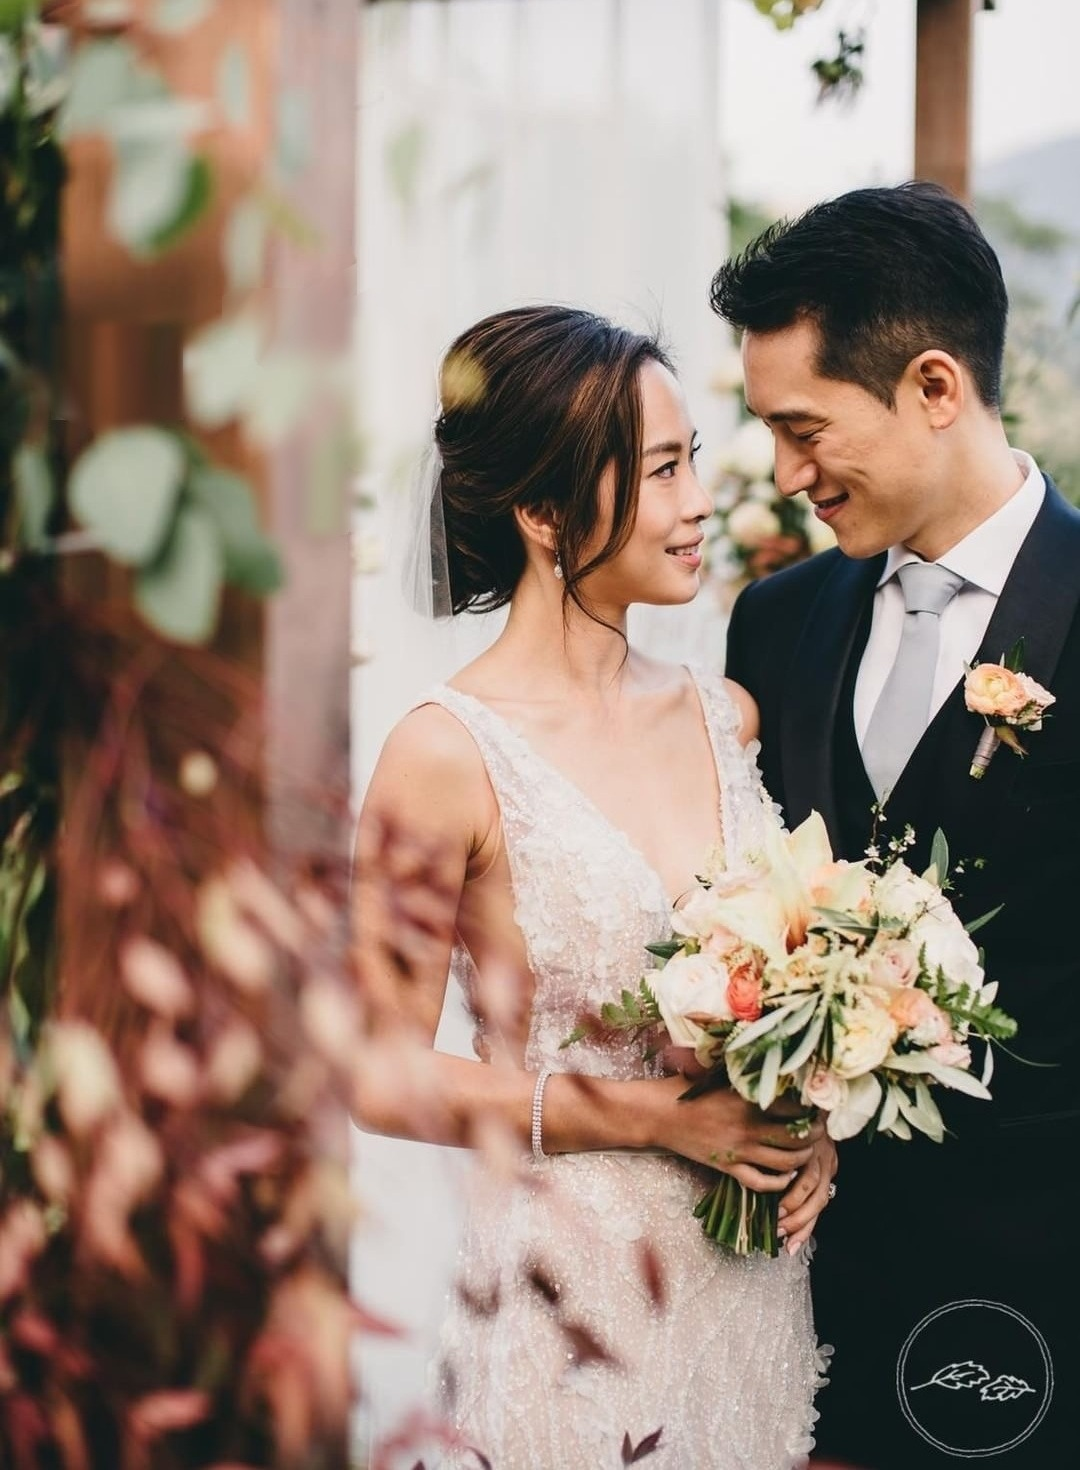 Fall-Inspired Wedding Hong Kong Country Club - Jessica & Jason